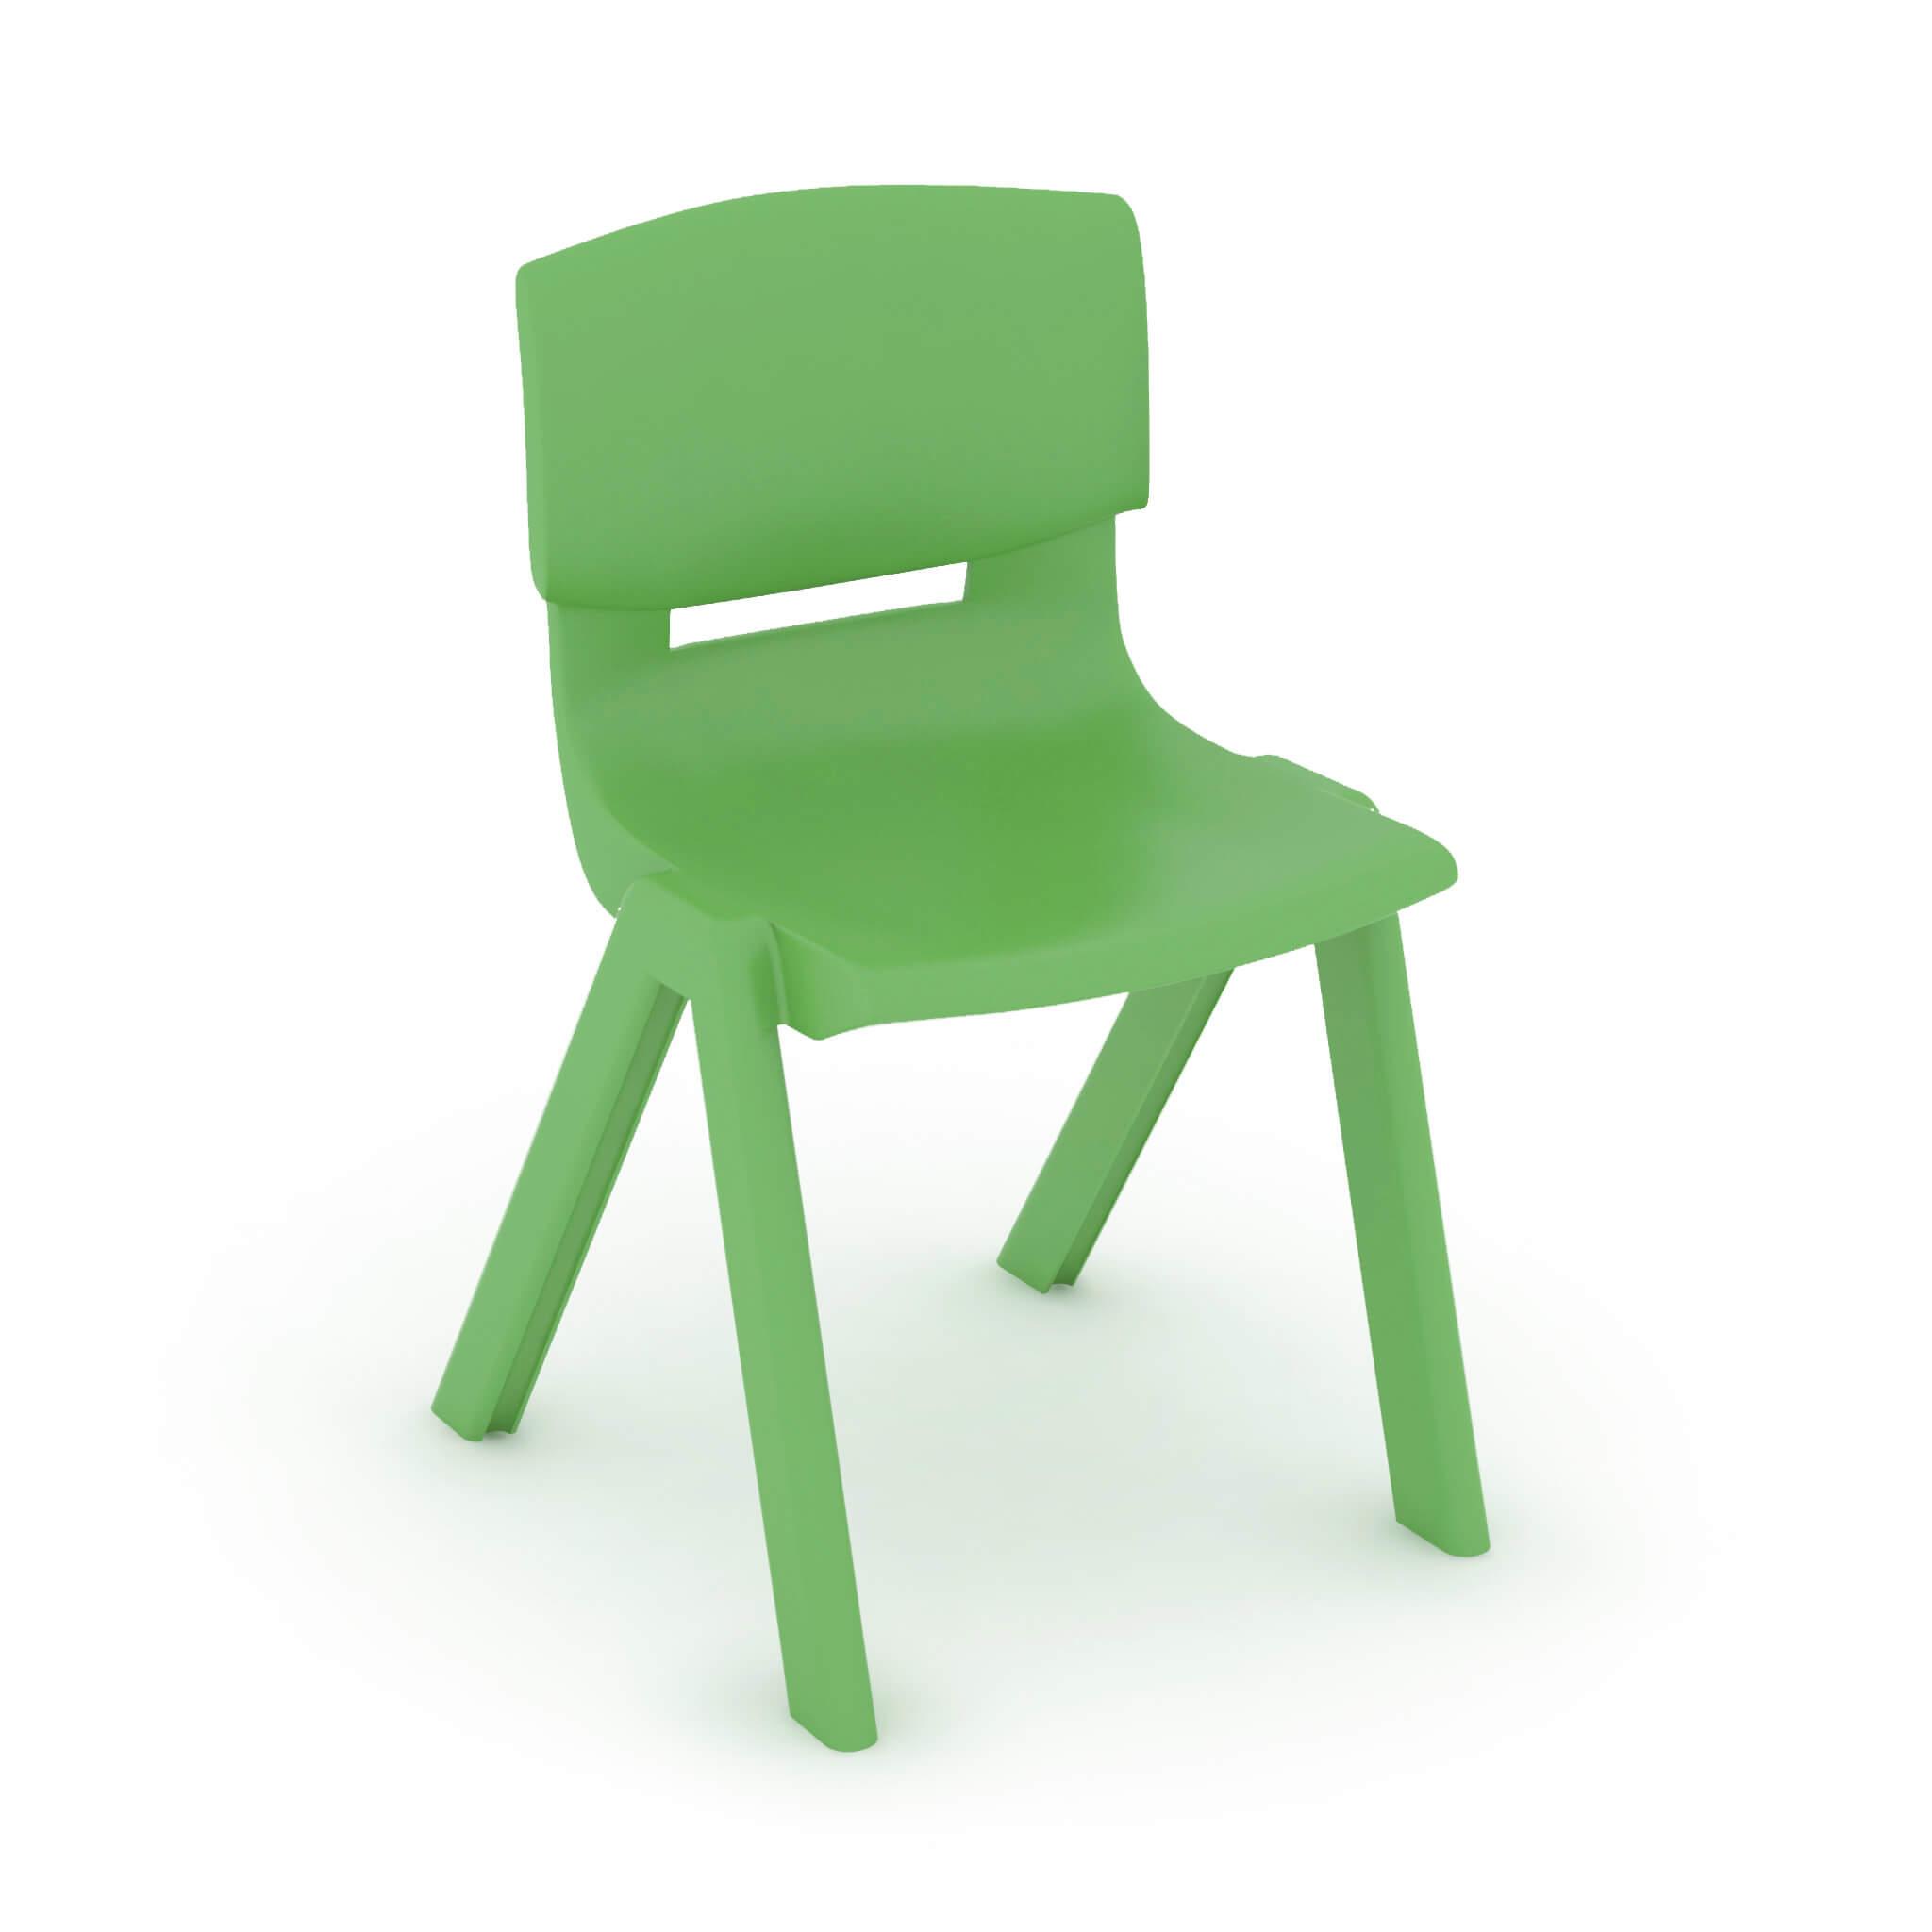 Silla escolar infantil verde